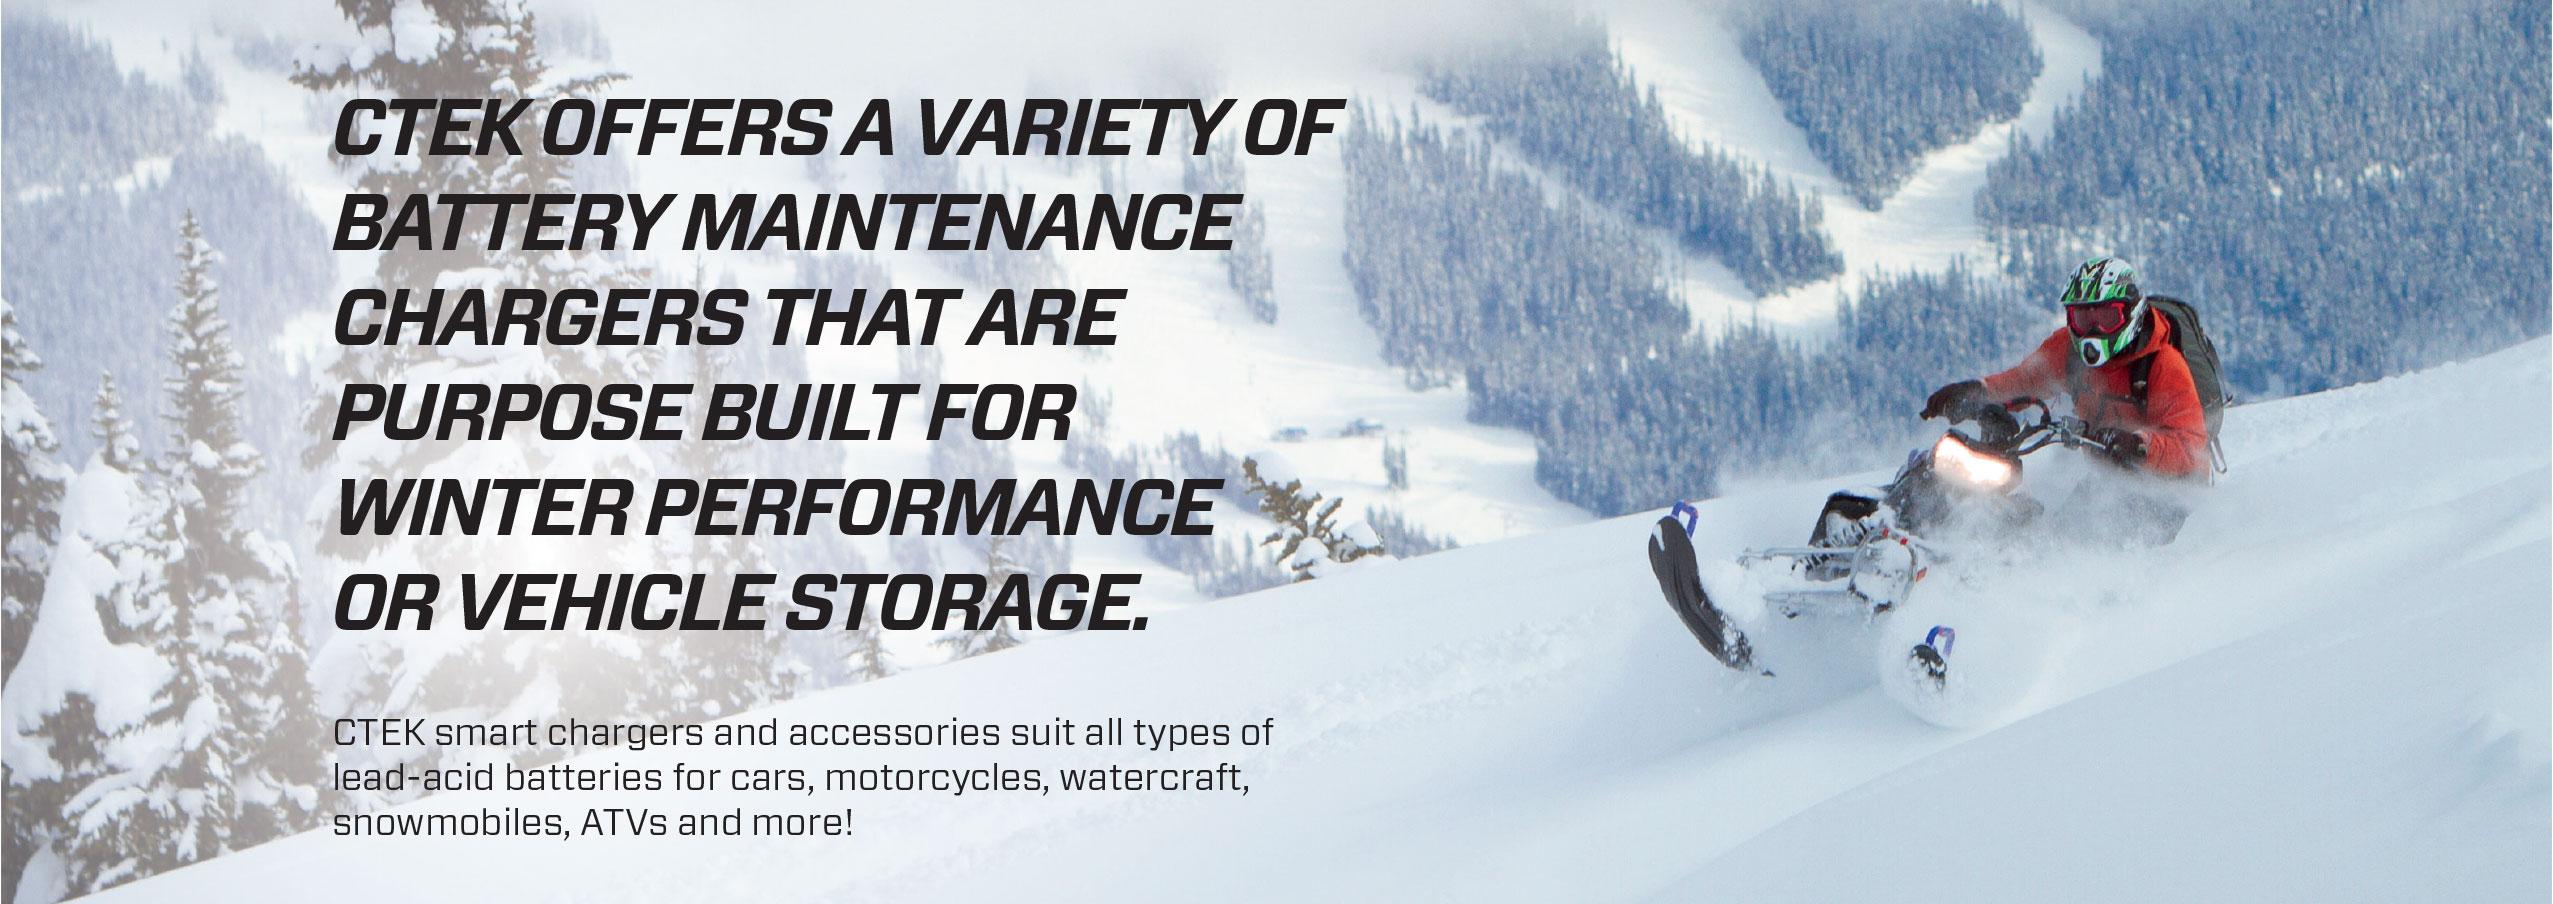 battery, maintenance, maintain, prep, winter